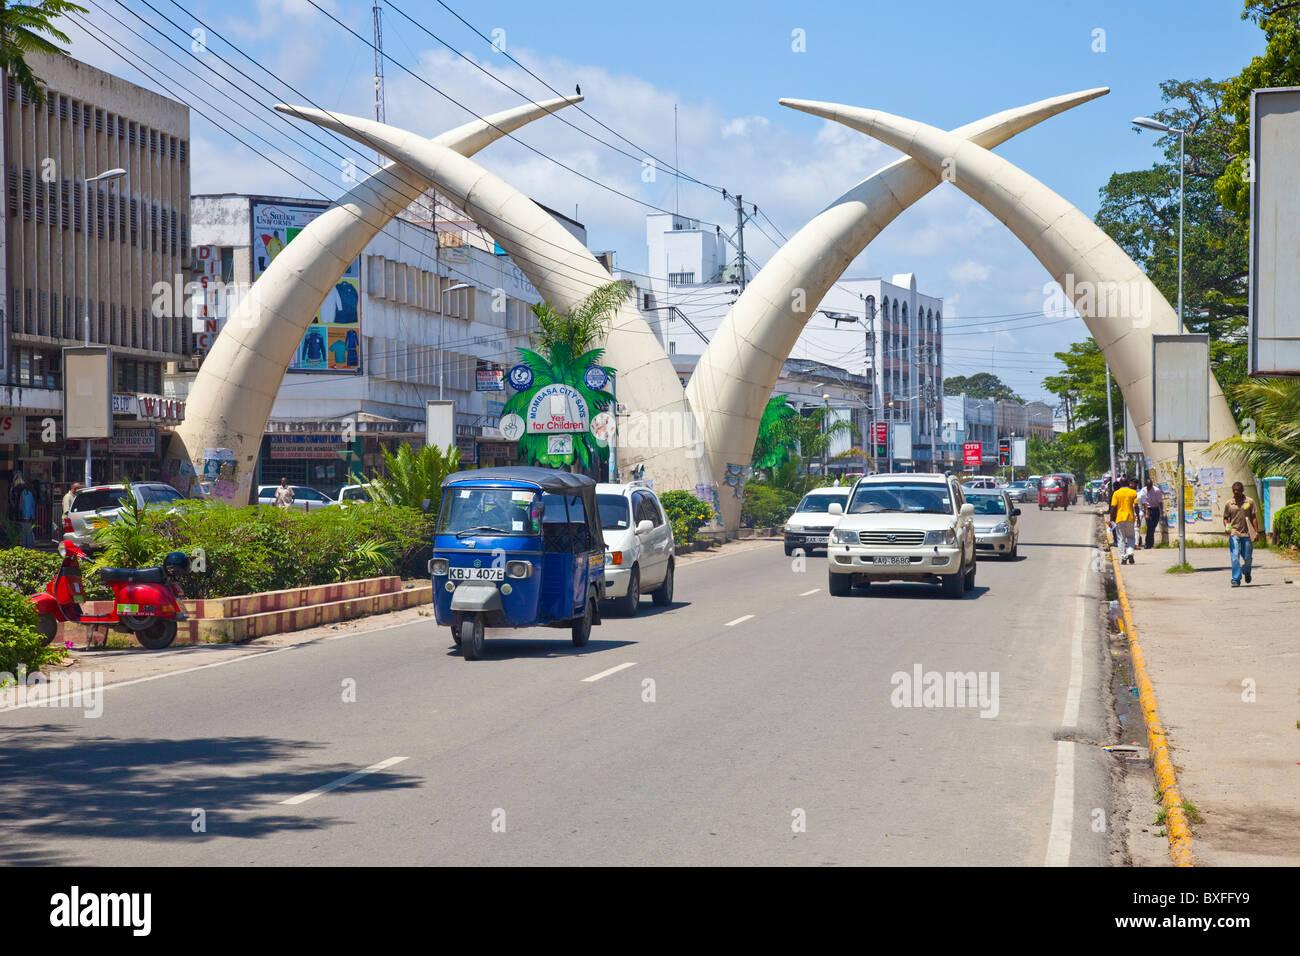 Colmillos, la avenida Moi, en Mombasa, Kenya Imagen De Stock